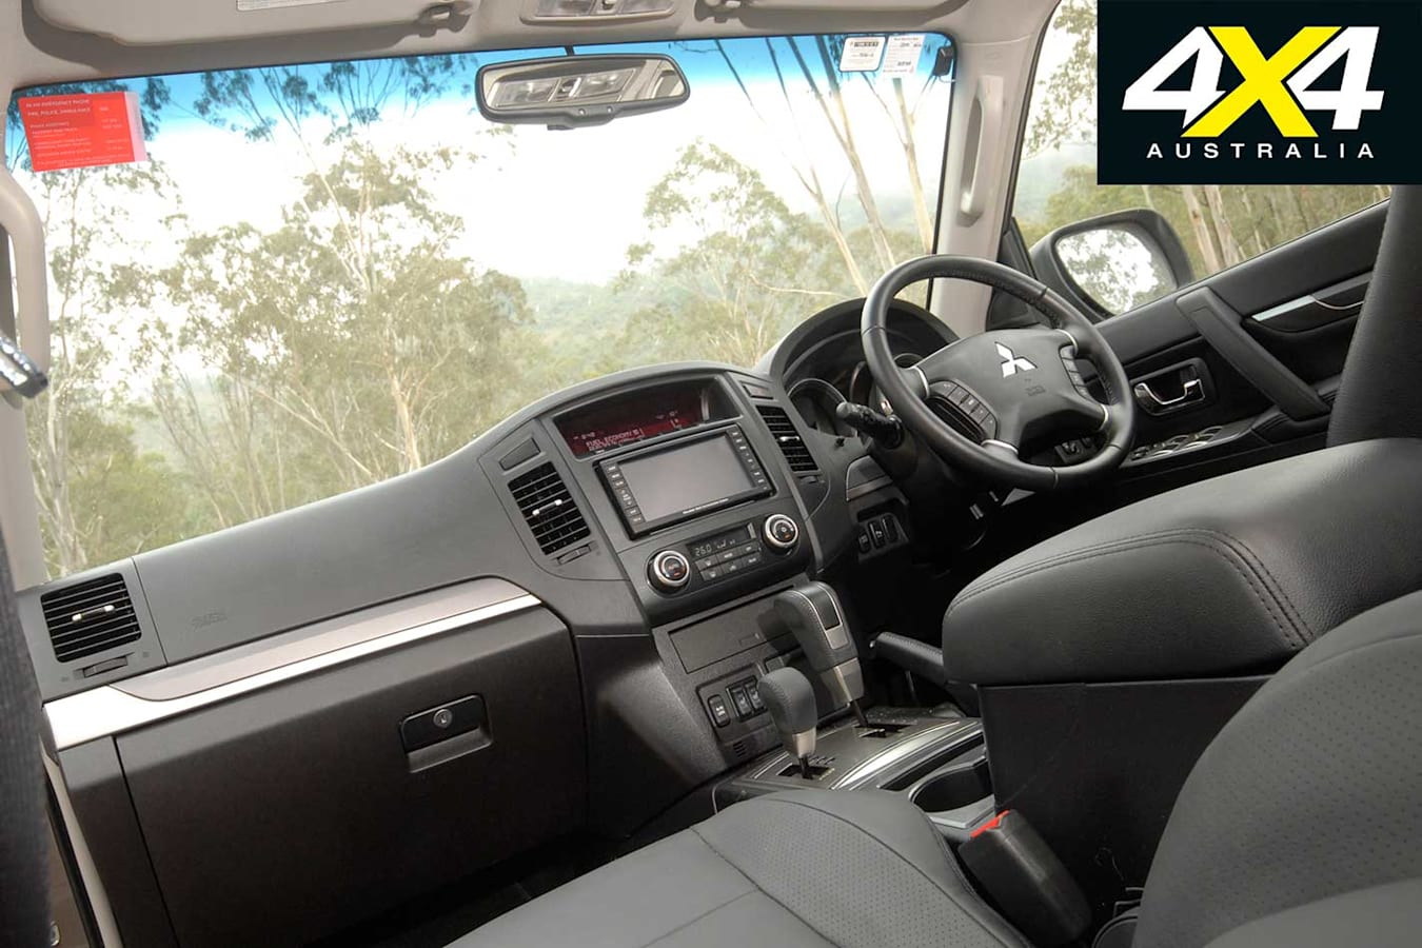 2009 Mitsubishi Pajero Interior Jpg